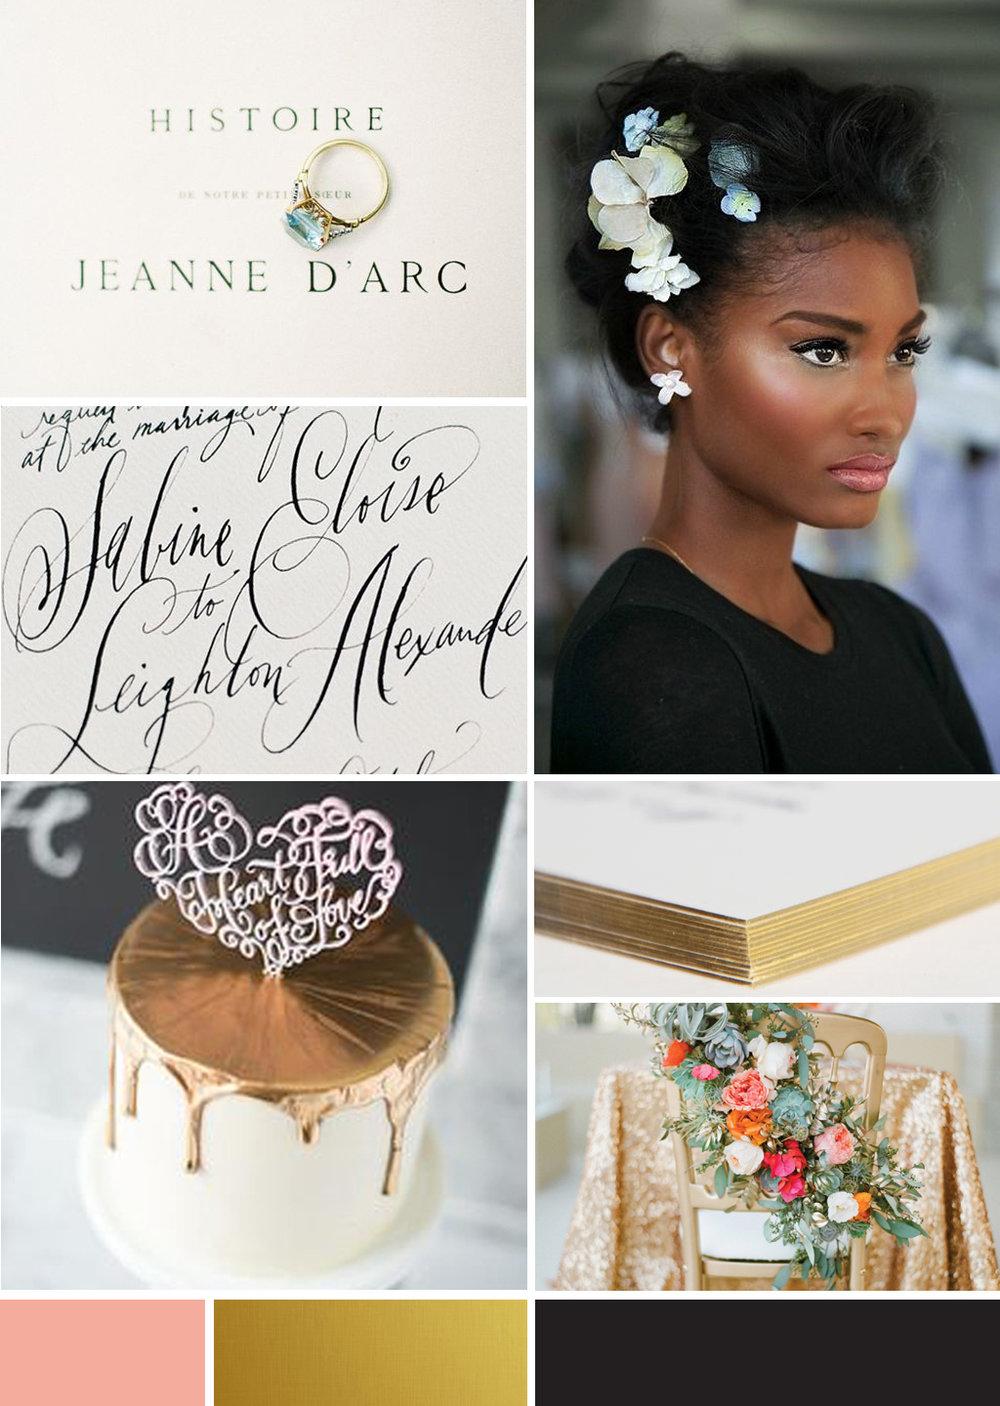 1. Elle France 2. Guilded Edges 3. Style Me Pretty 4. Butter Cream Bake Shop 5. Stephanie Fishwick 6. Alicia Malicia